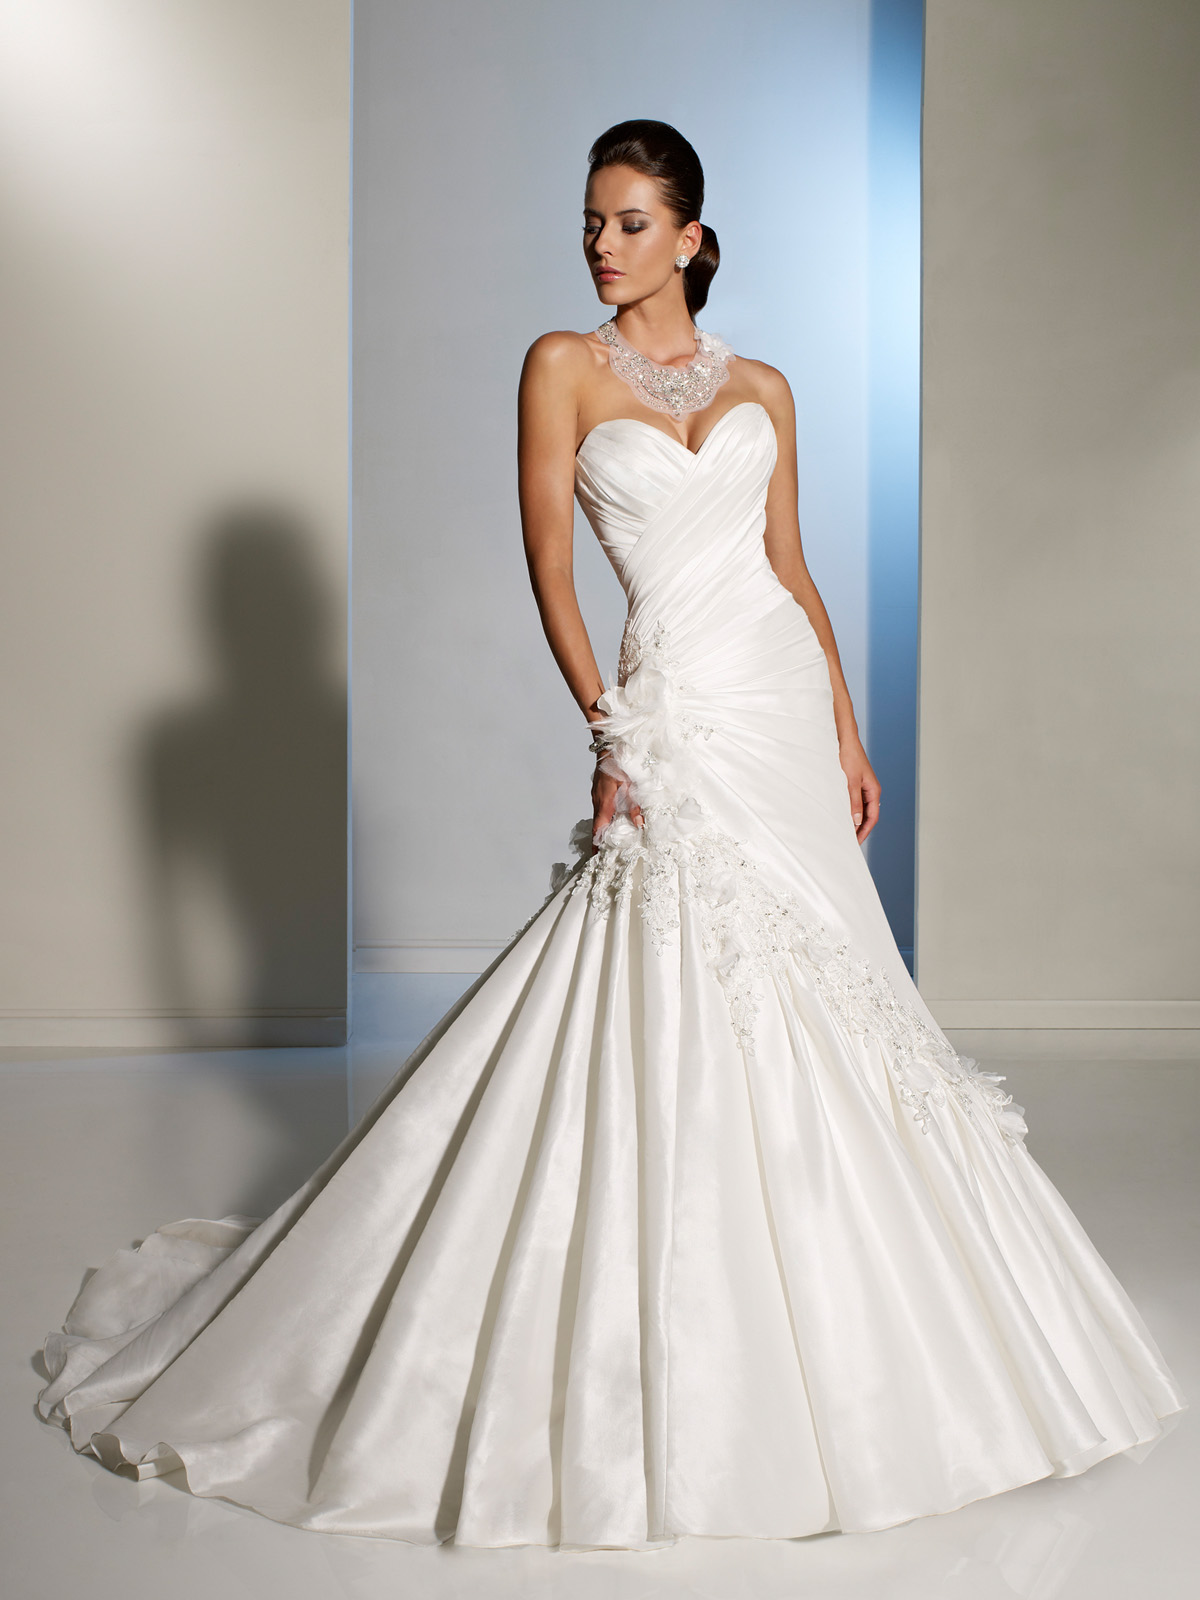 bridal dresses uk modern twist wedding dresses by sophia With sophia wedding dress